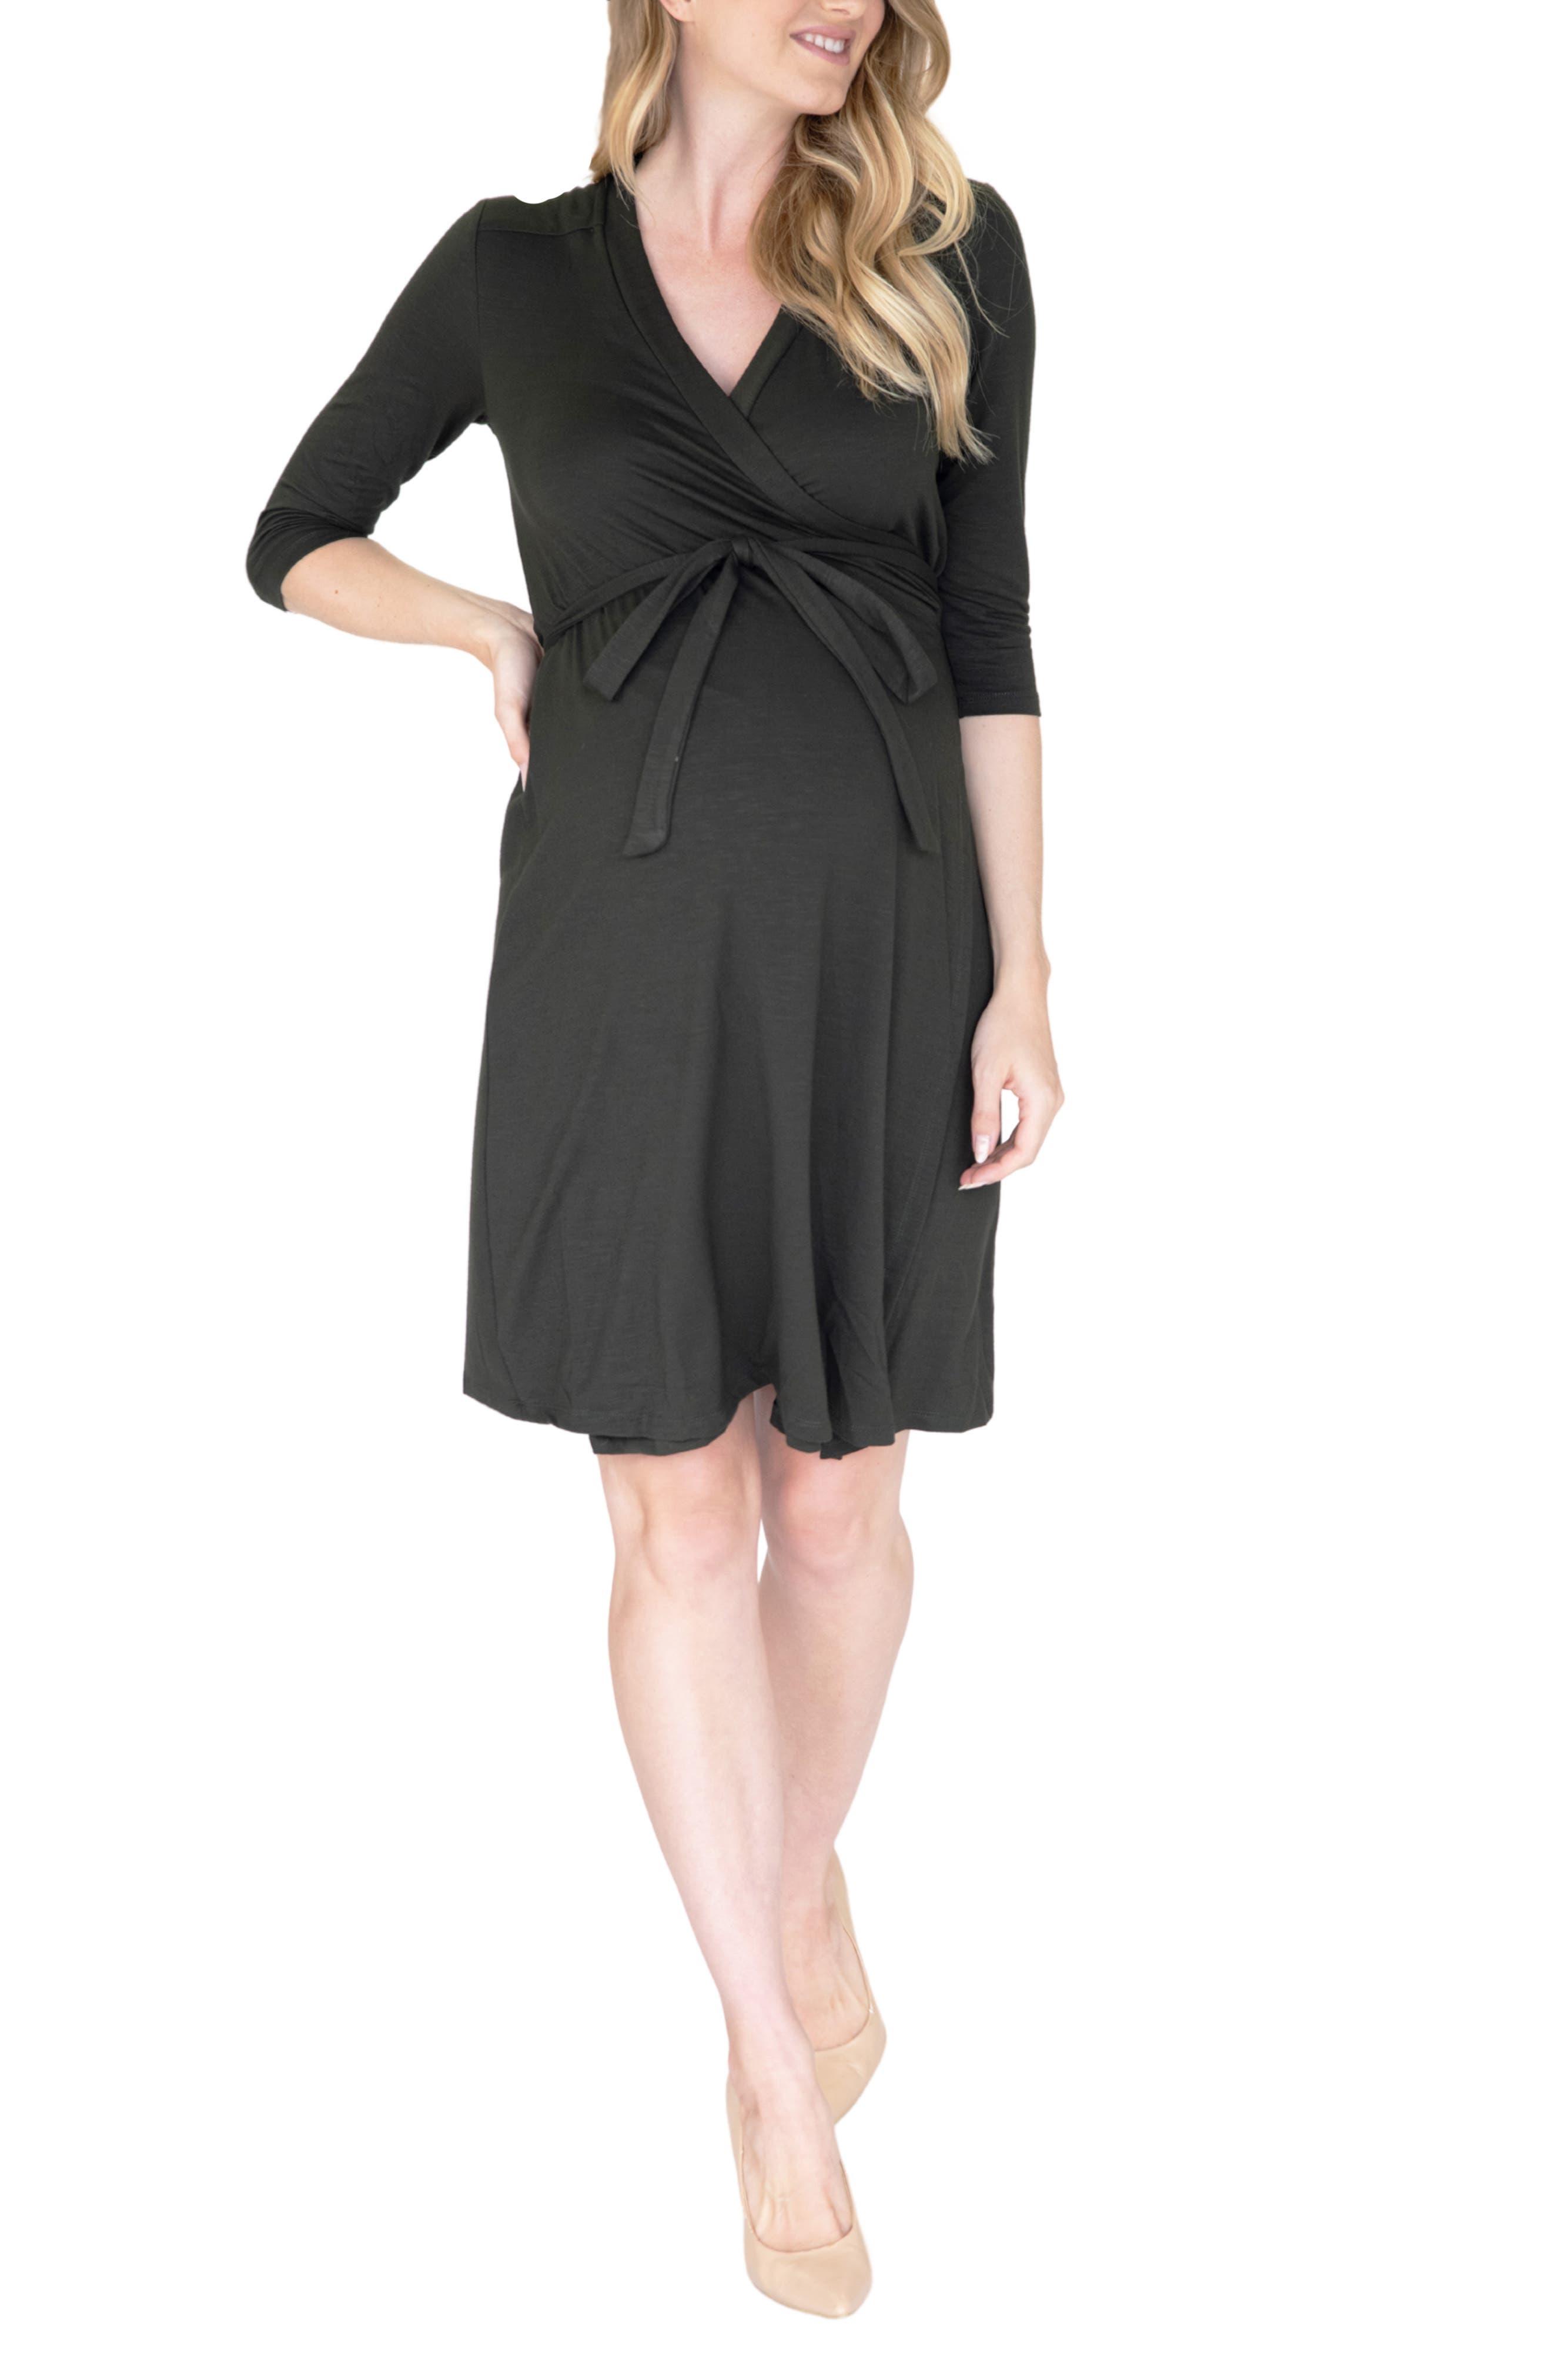 Empire Waist Maternity/nursing Wrap Dress